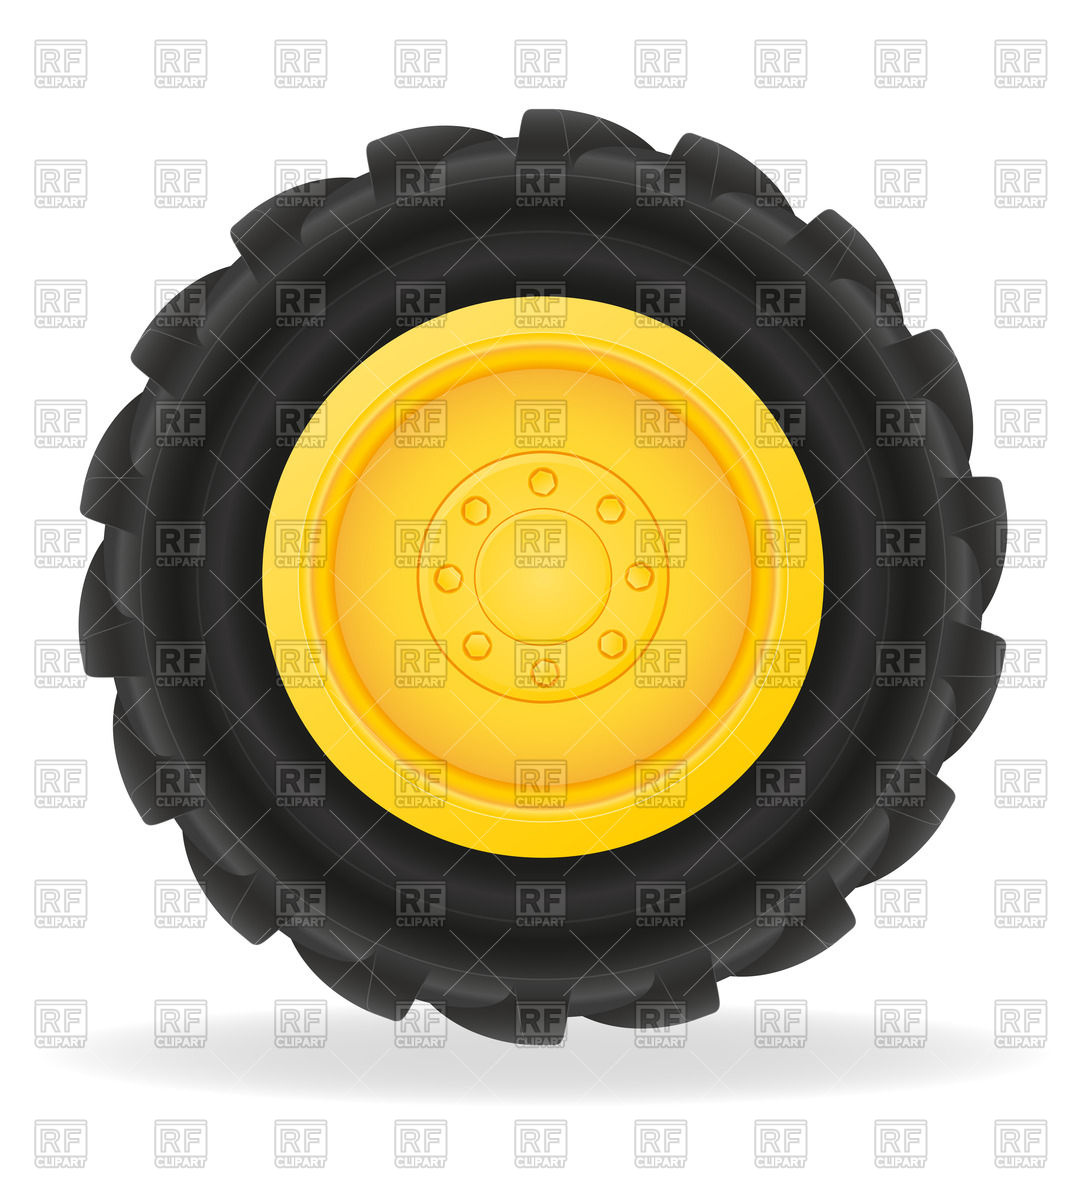 Clip Art Tractor Wheels : Case ih symbol clipart suggest